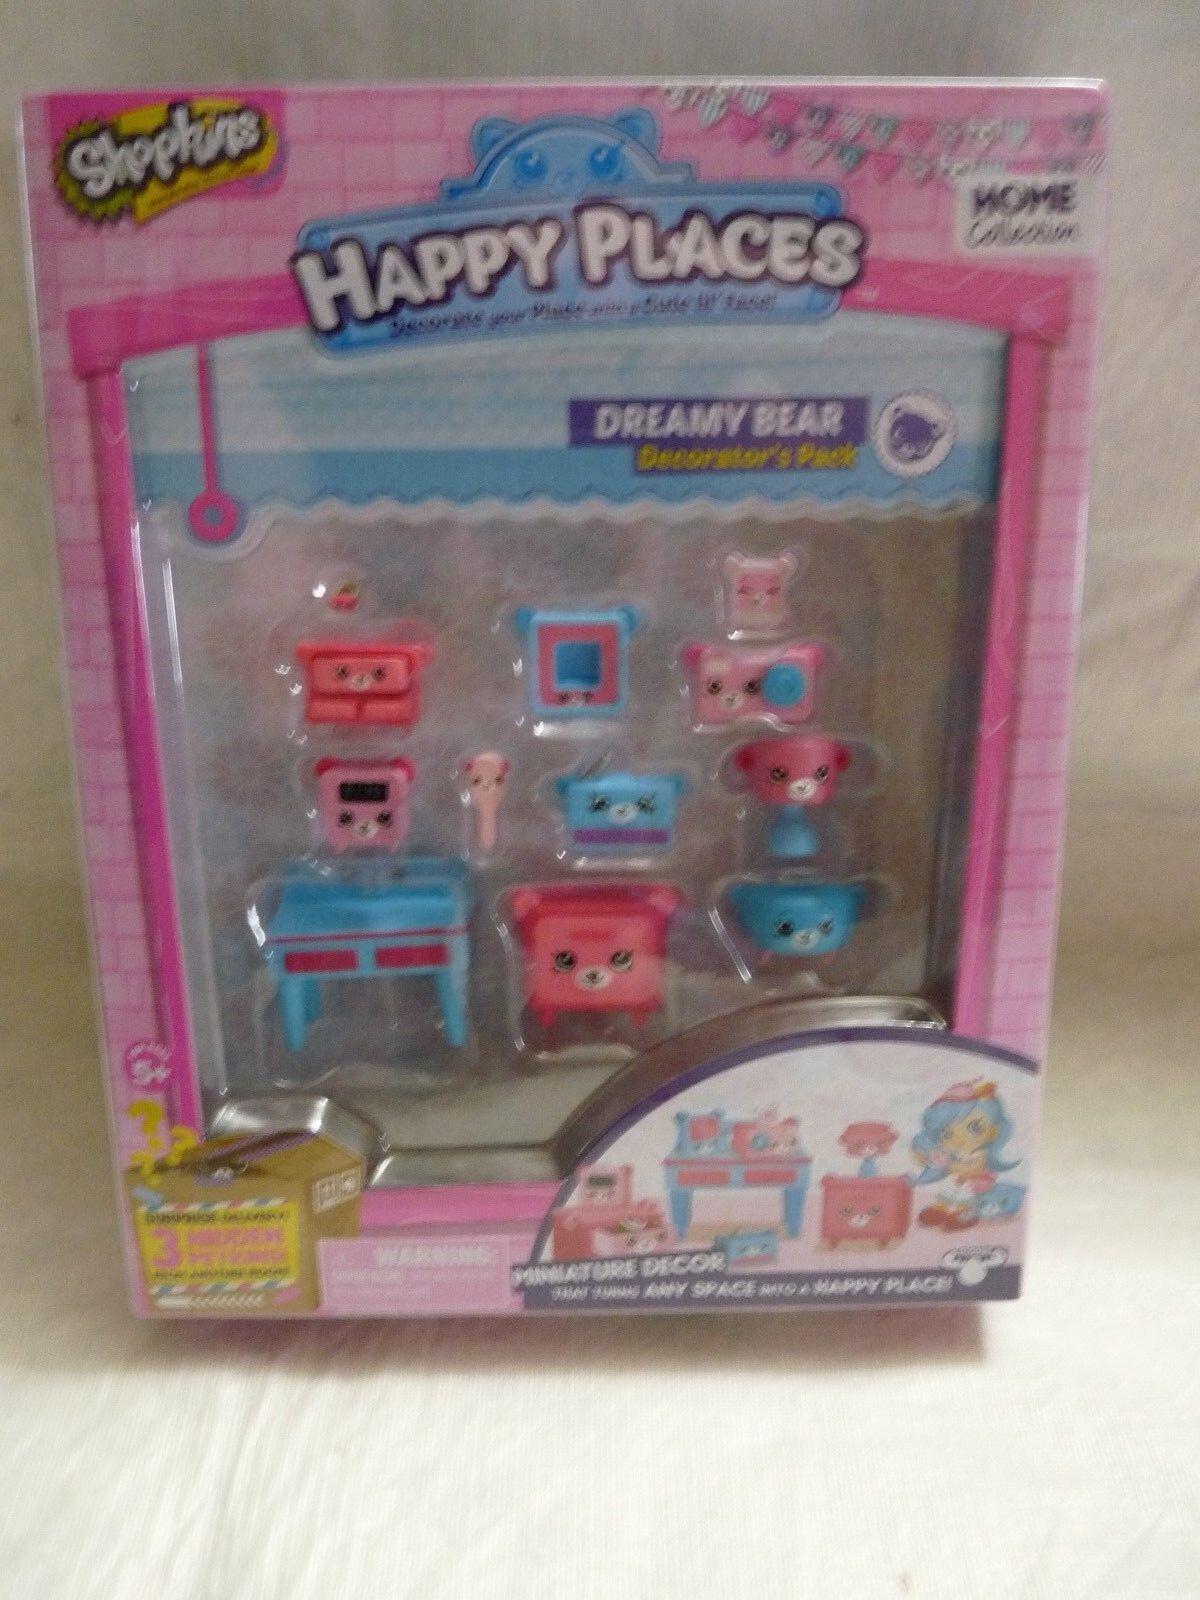 Shopkins Decorator Pack Dreamy Bear Playset